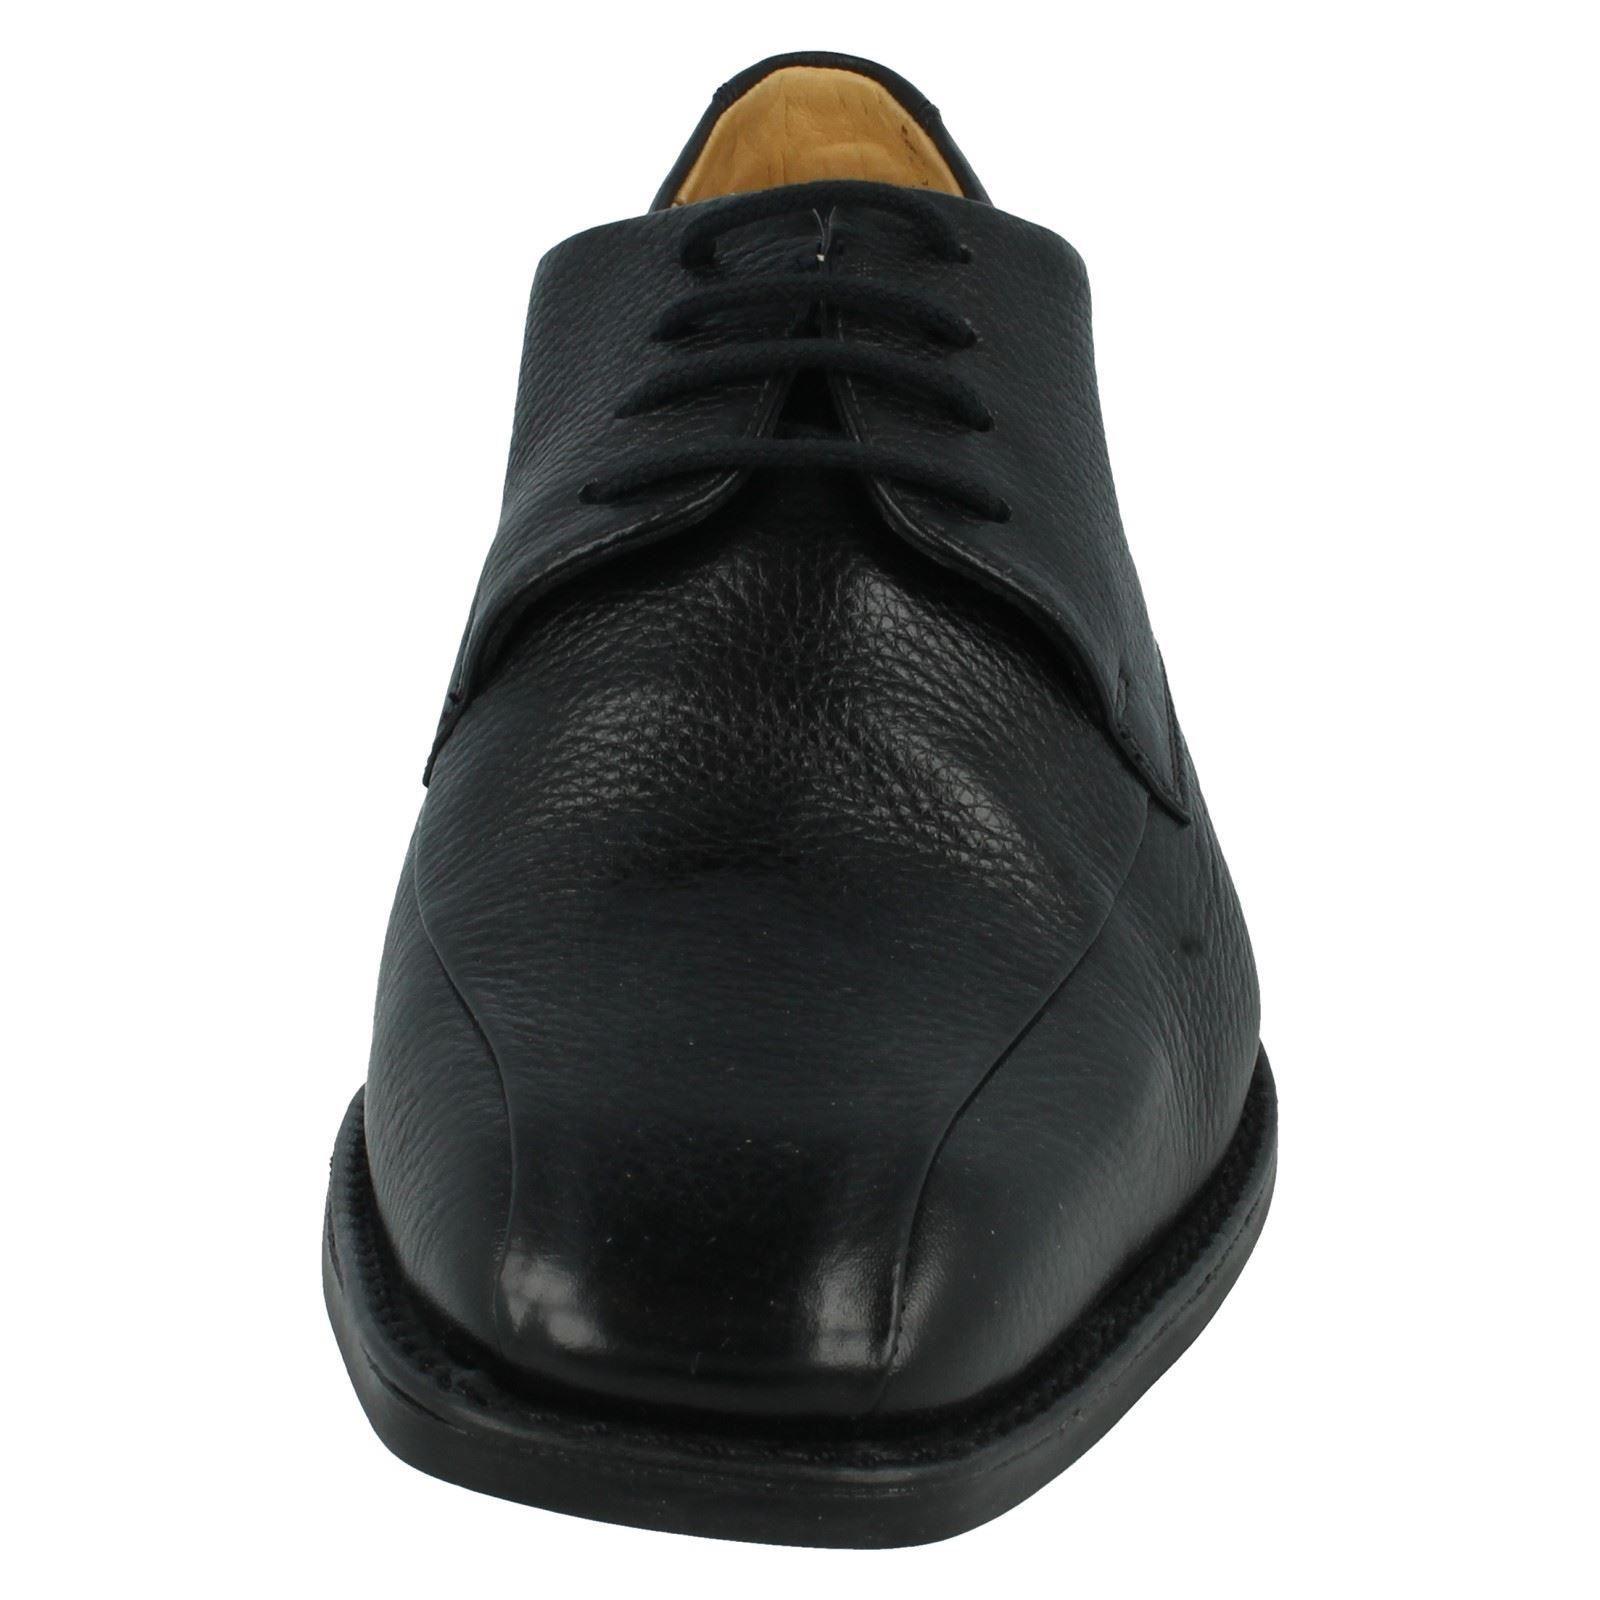 Herren Anatomic New  Co Formal Schuhes - New Anatomic Bonito 35b81a